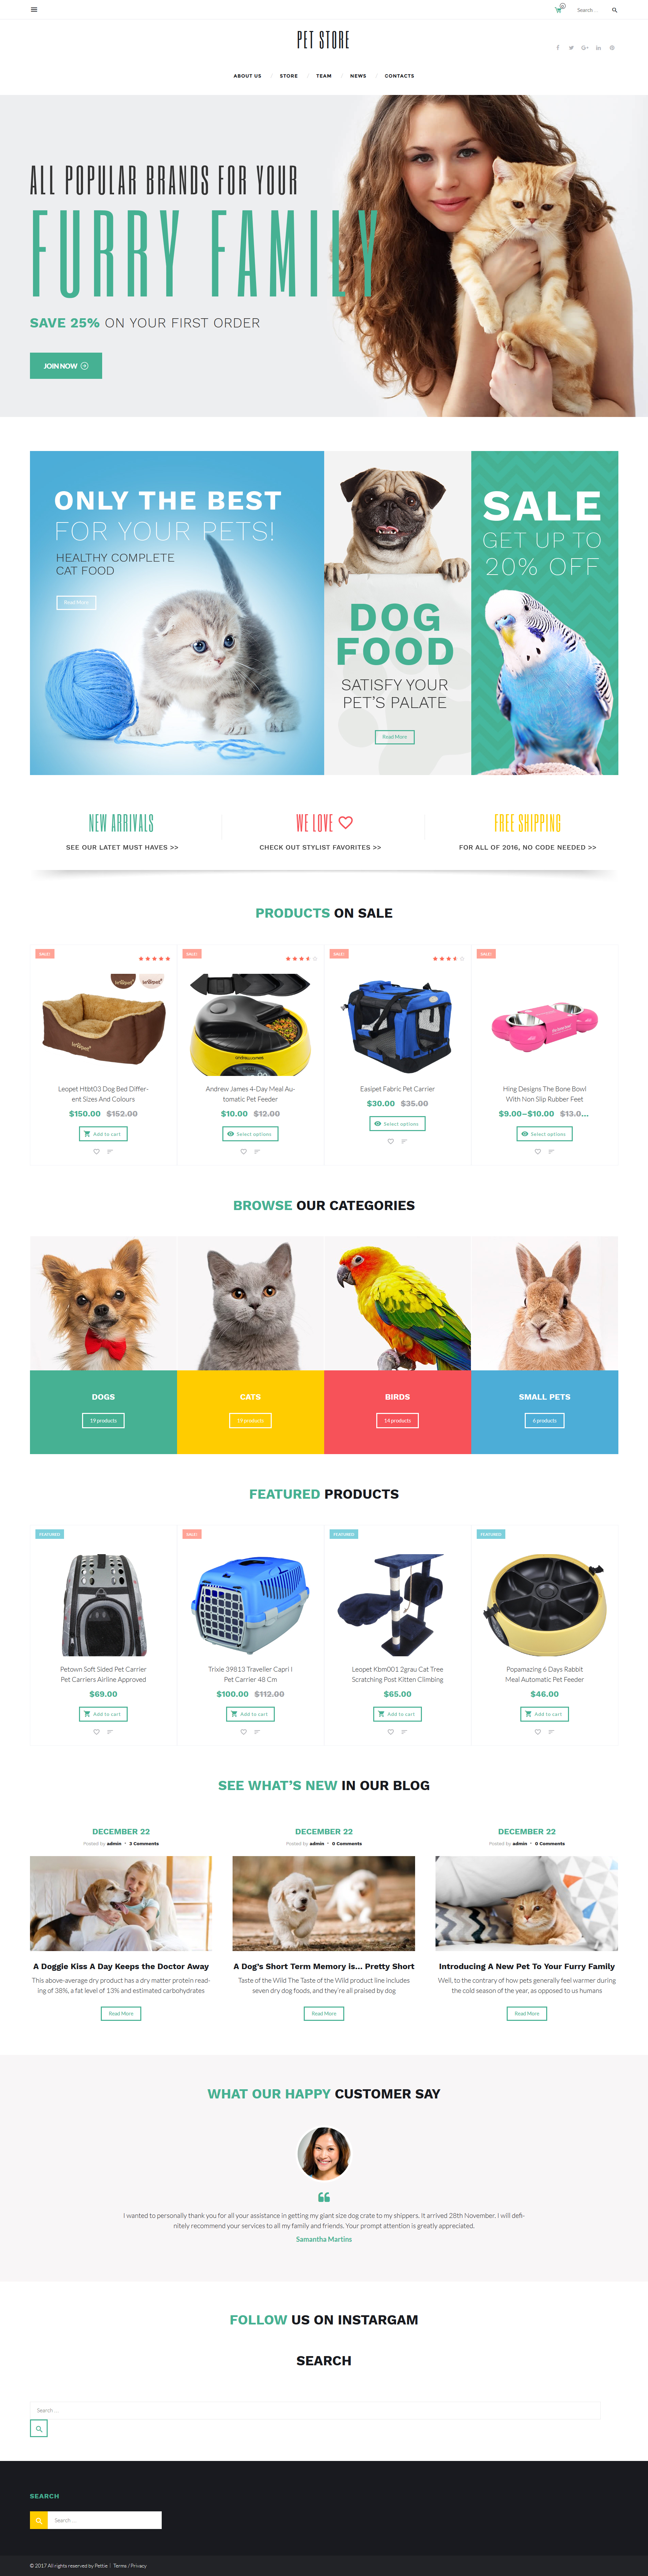 "Template WooCommerce Responsive #58660 ""PetStore - Pets Supplies Shop Responsive WooCommerce Theme"" - screenshot"